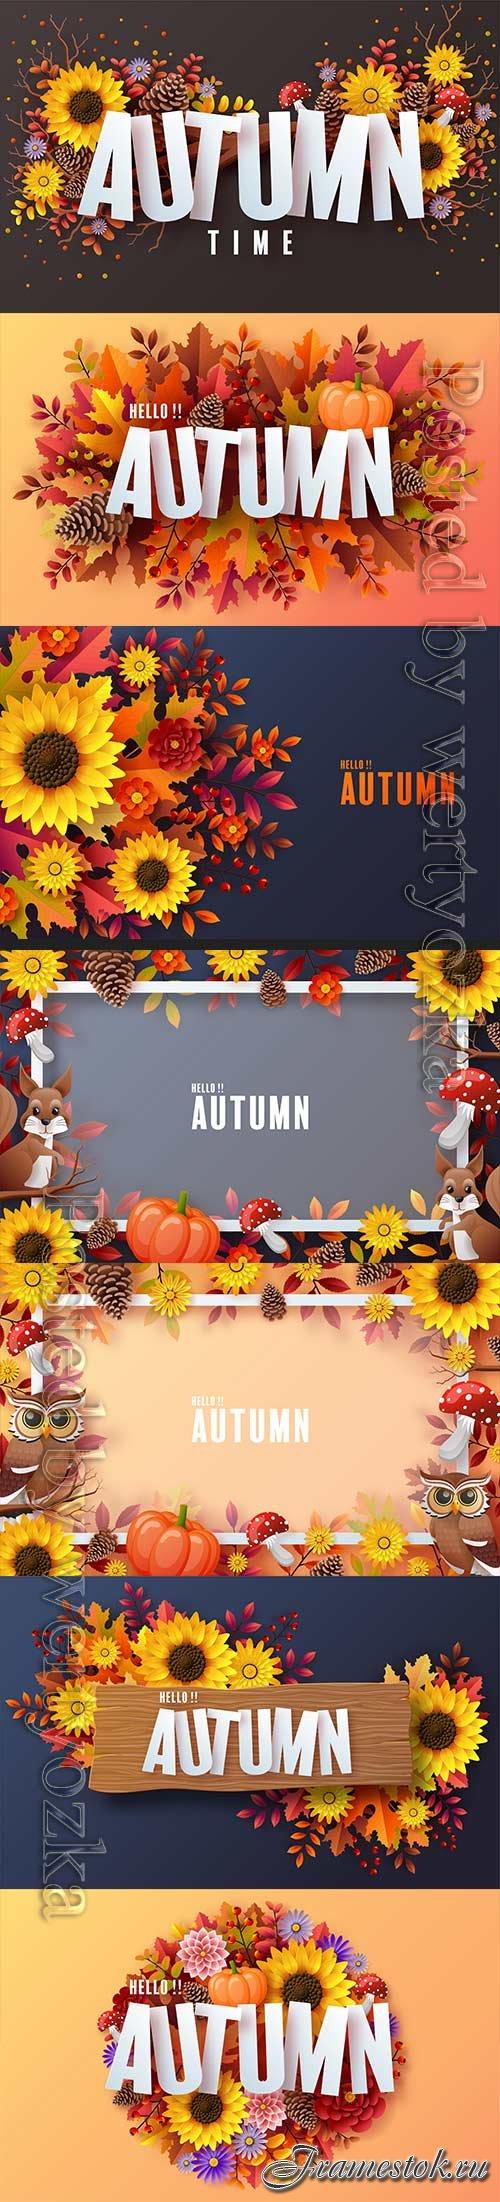 Autumn holiday seasonal vector background